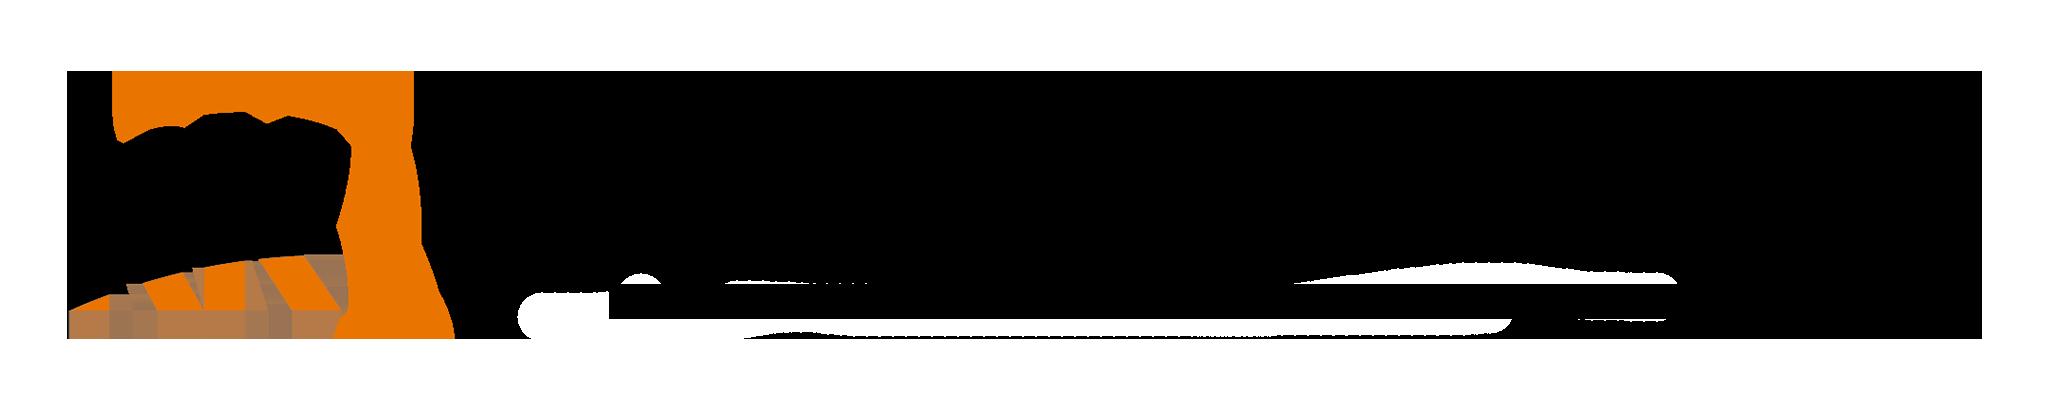 Logotipo Palanca Fontestad horizontal